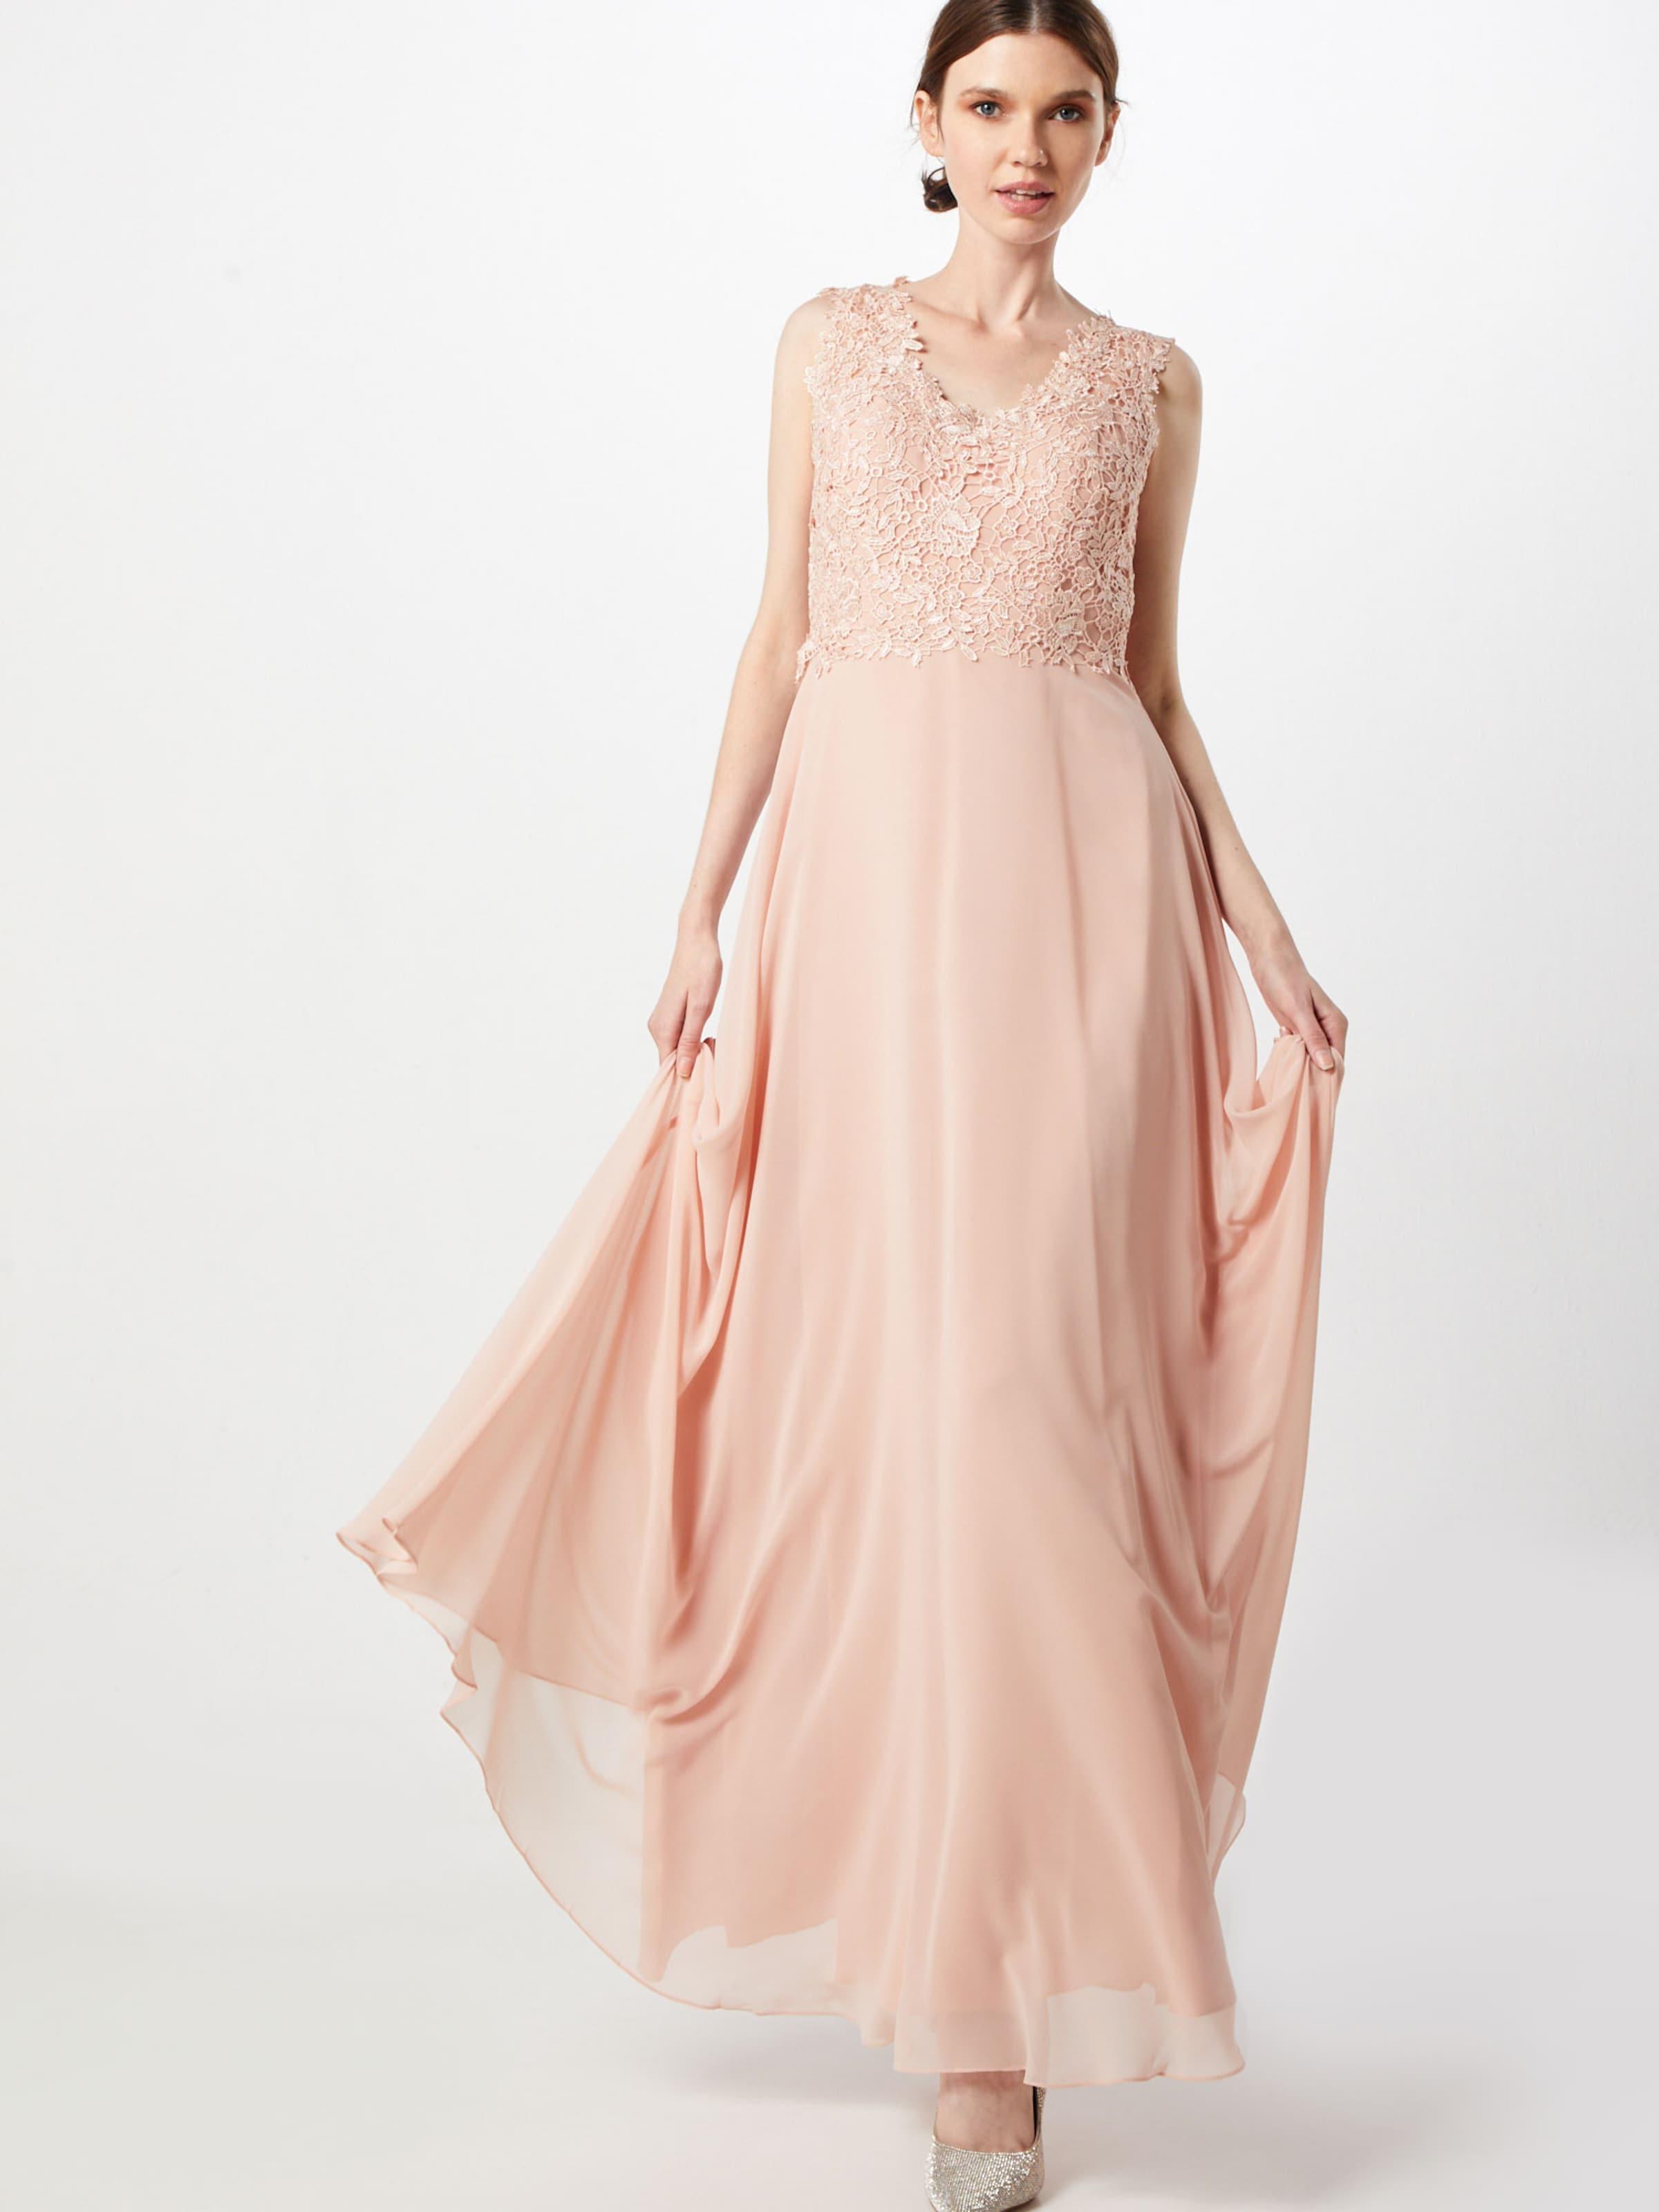 Rosé Kleid Rosé Laona Rosé Laona Kleid In Laona Kleid In In rQtsdh